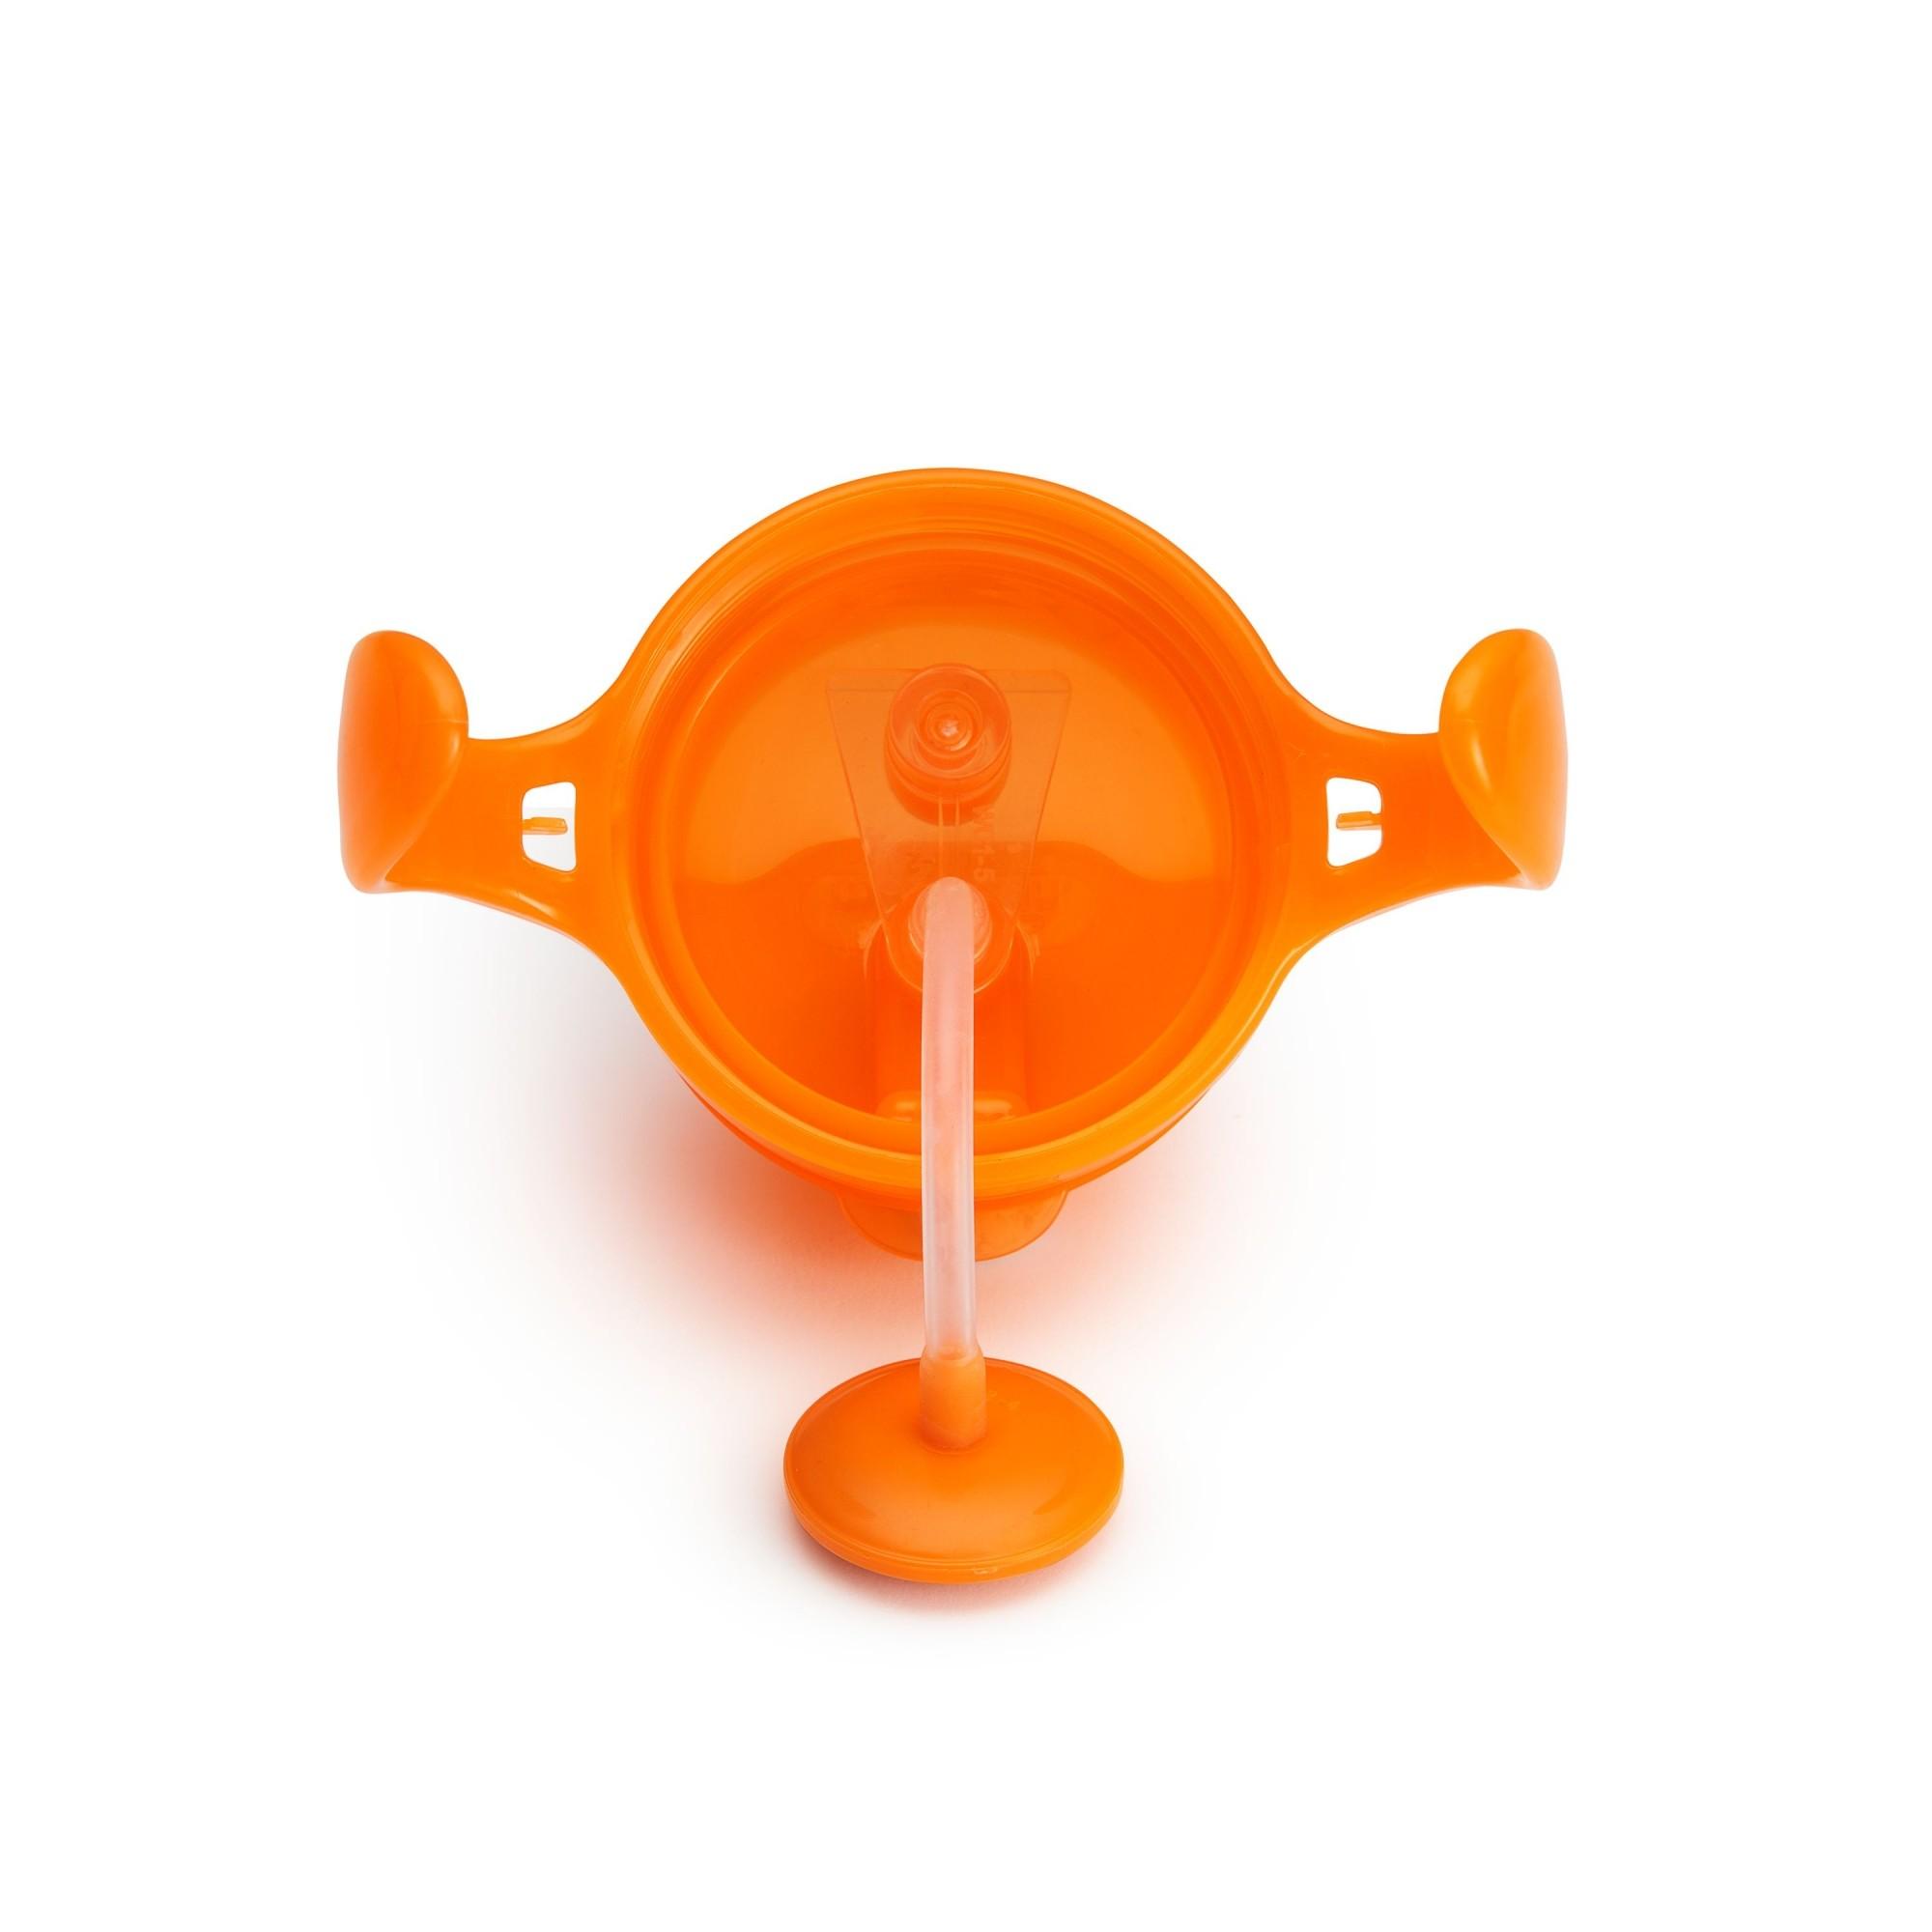 Copo Treinamento com Canudo Click Lock Laranja - Munchkin